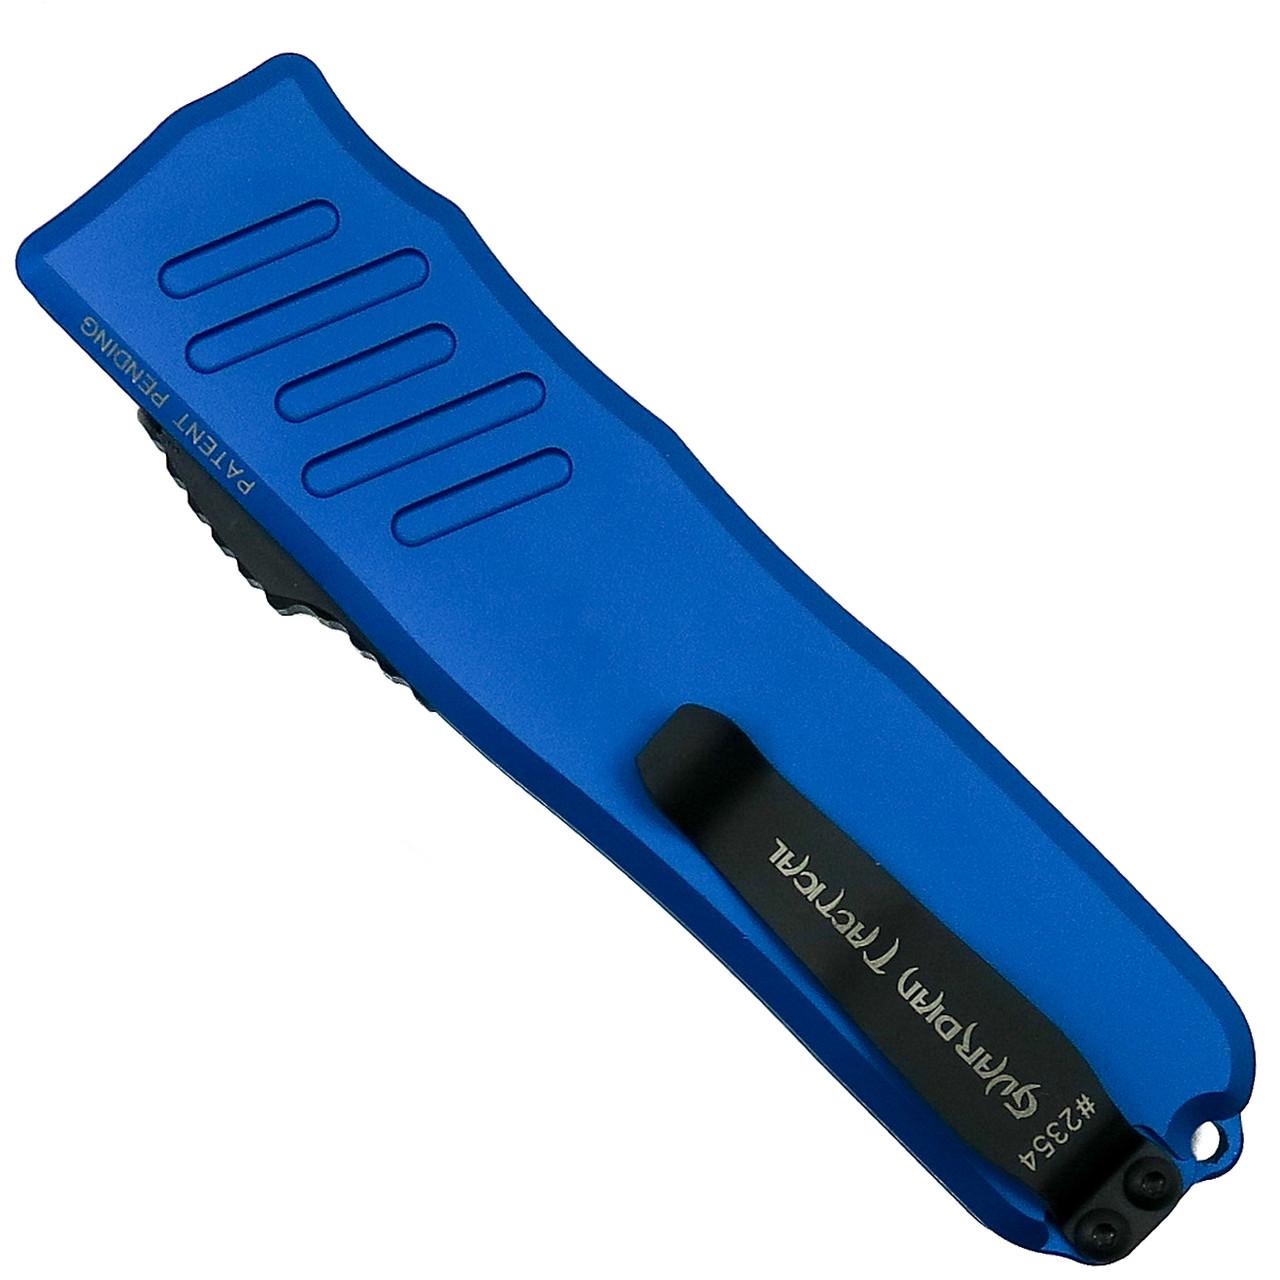 Guardian Tactical Blue RECON-035 Dagger OTF Auto Knife, Black Combo Blade Back